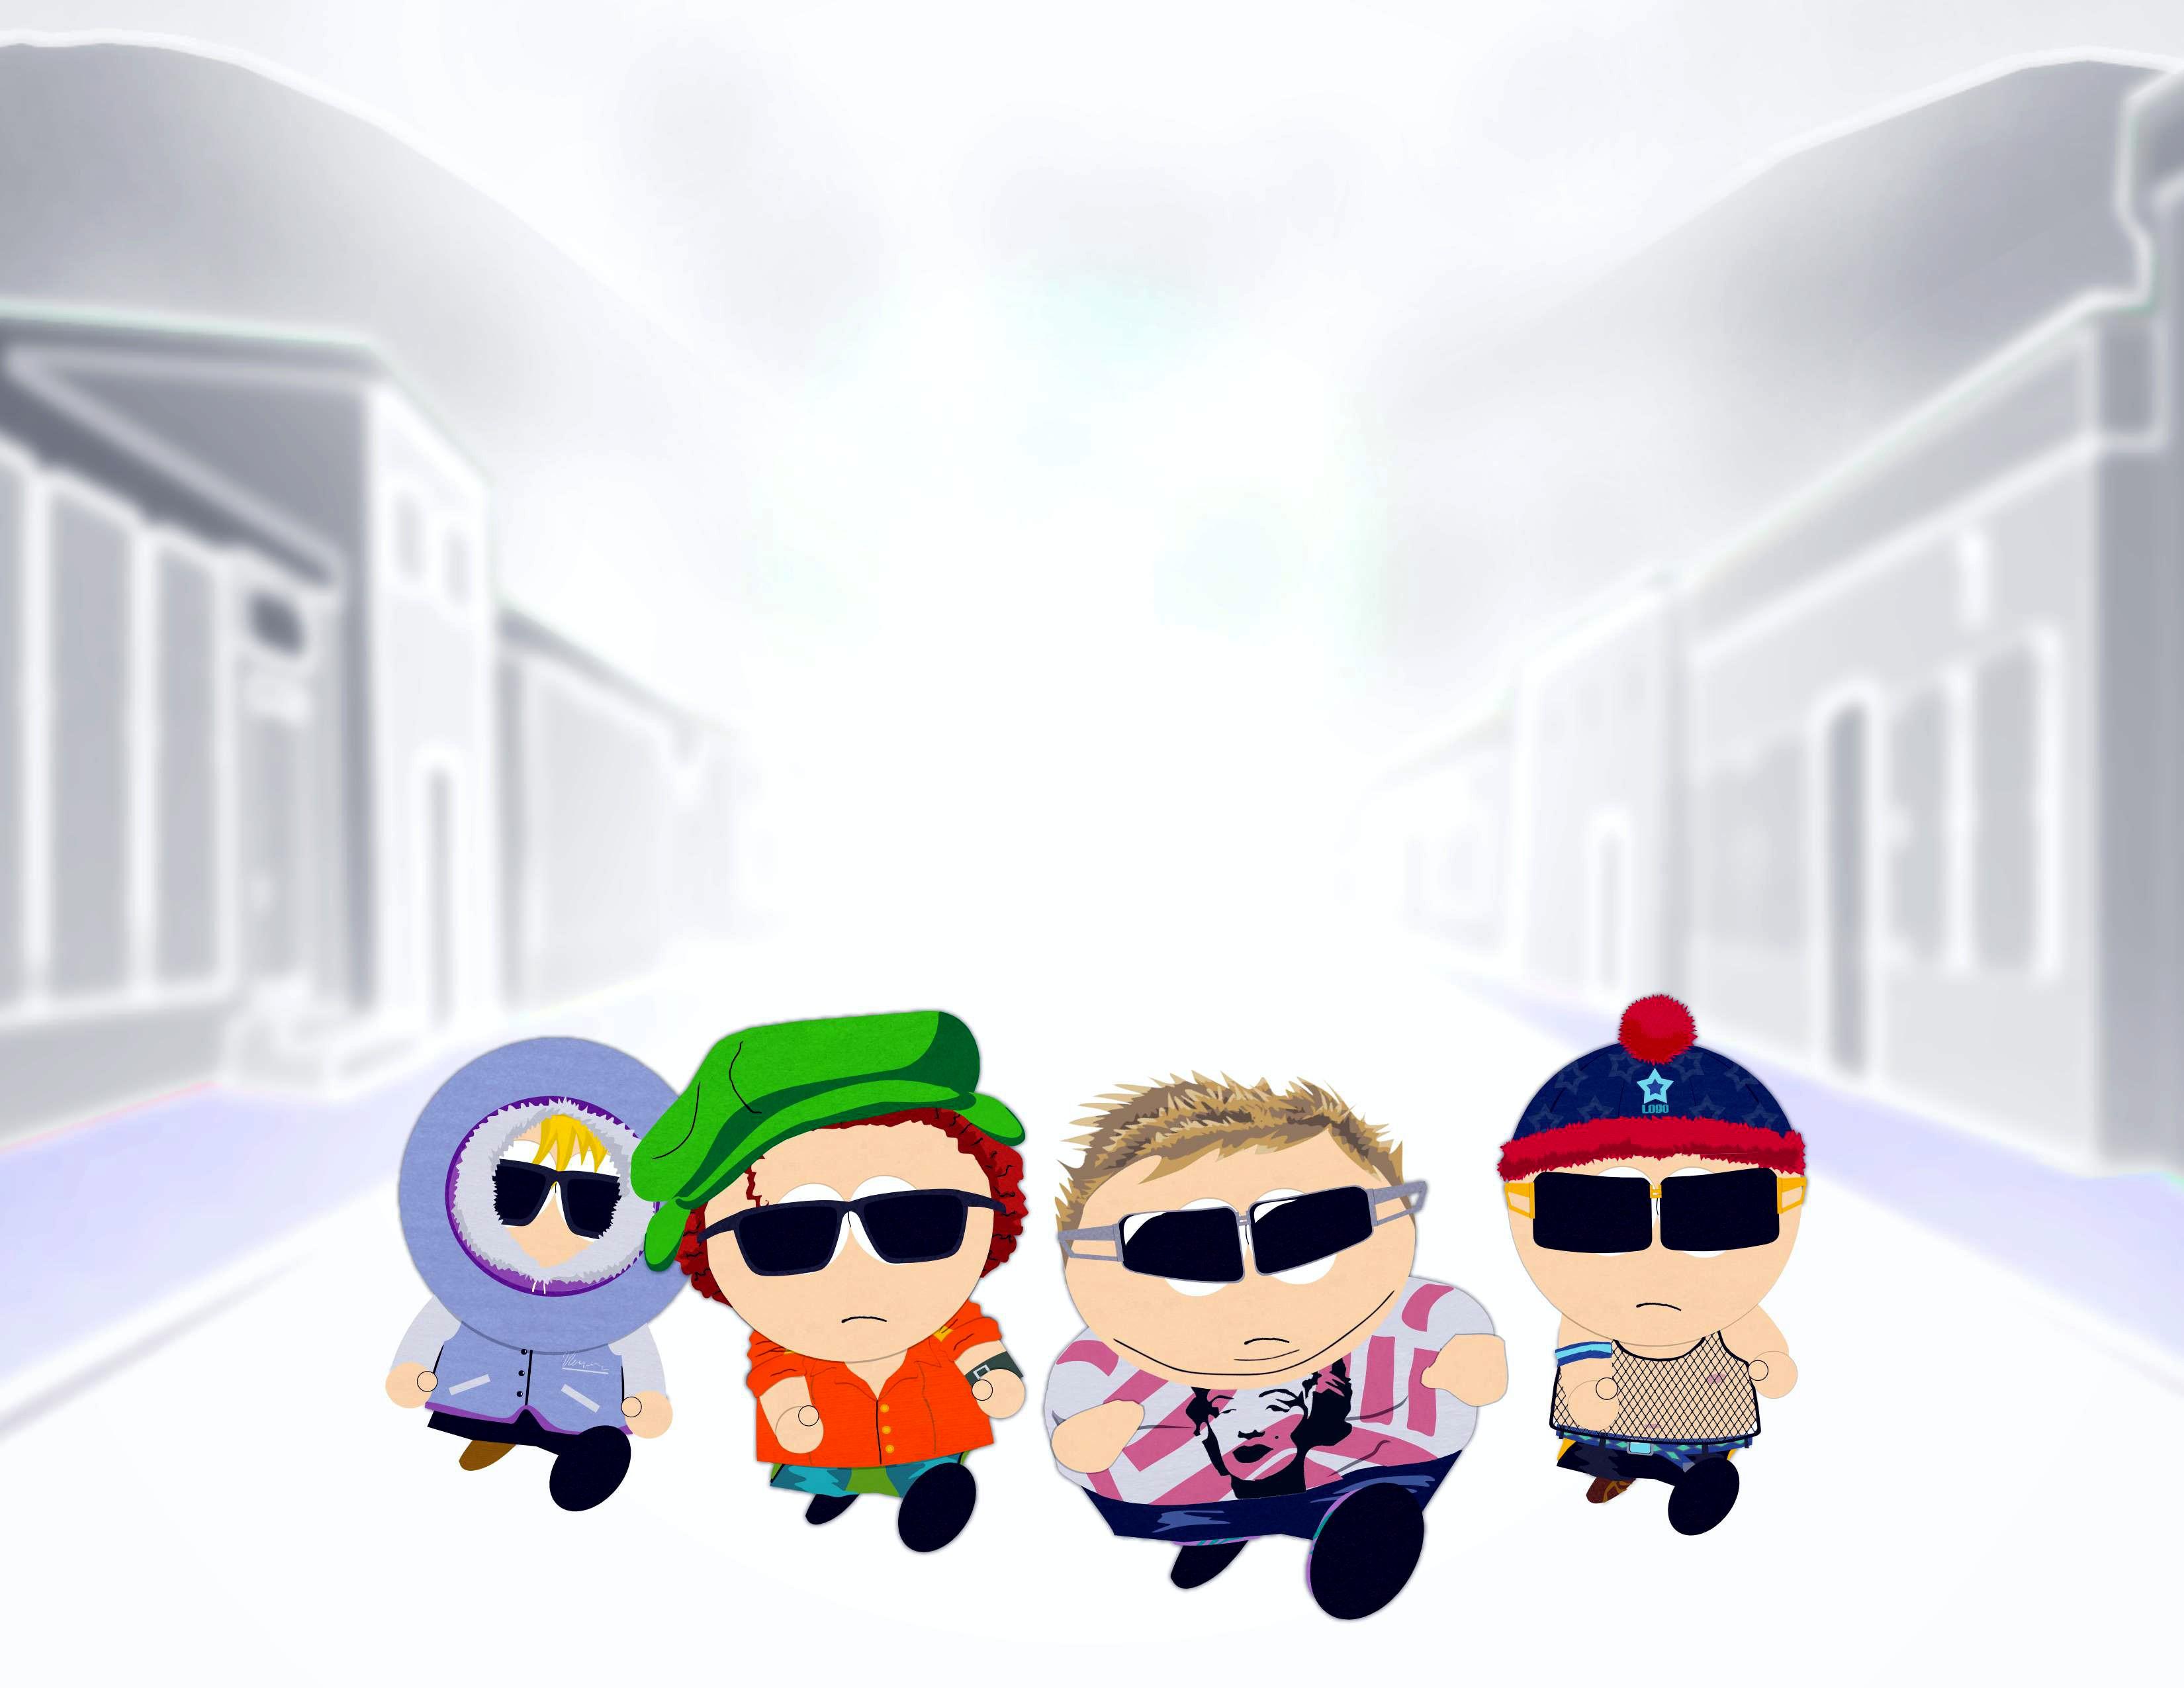 Cool Wallpaper Mac South Park - 33018  You Should Have_511434.jpg